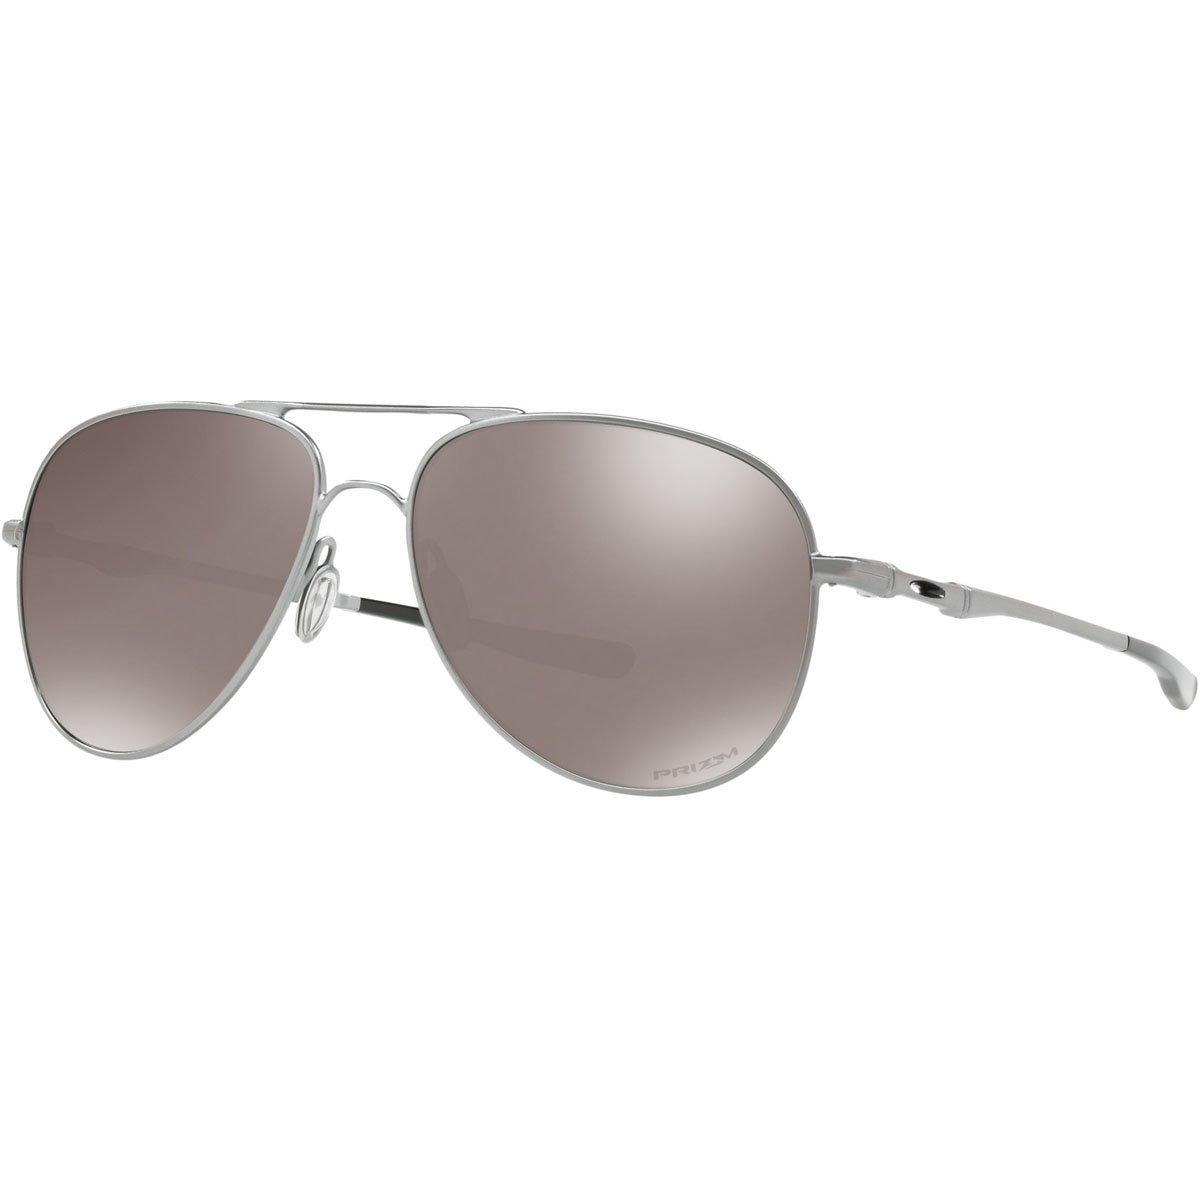 Oakley Metal Unisex Polarized Aviator Sunglasses, Lead, 60 mm